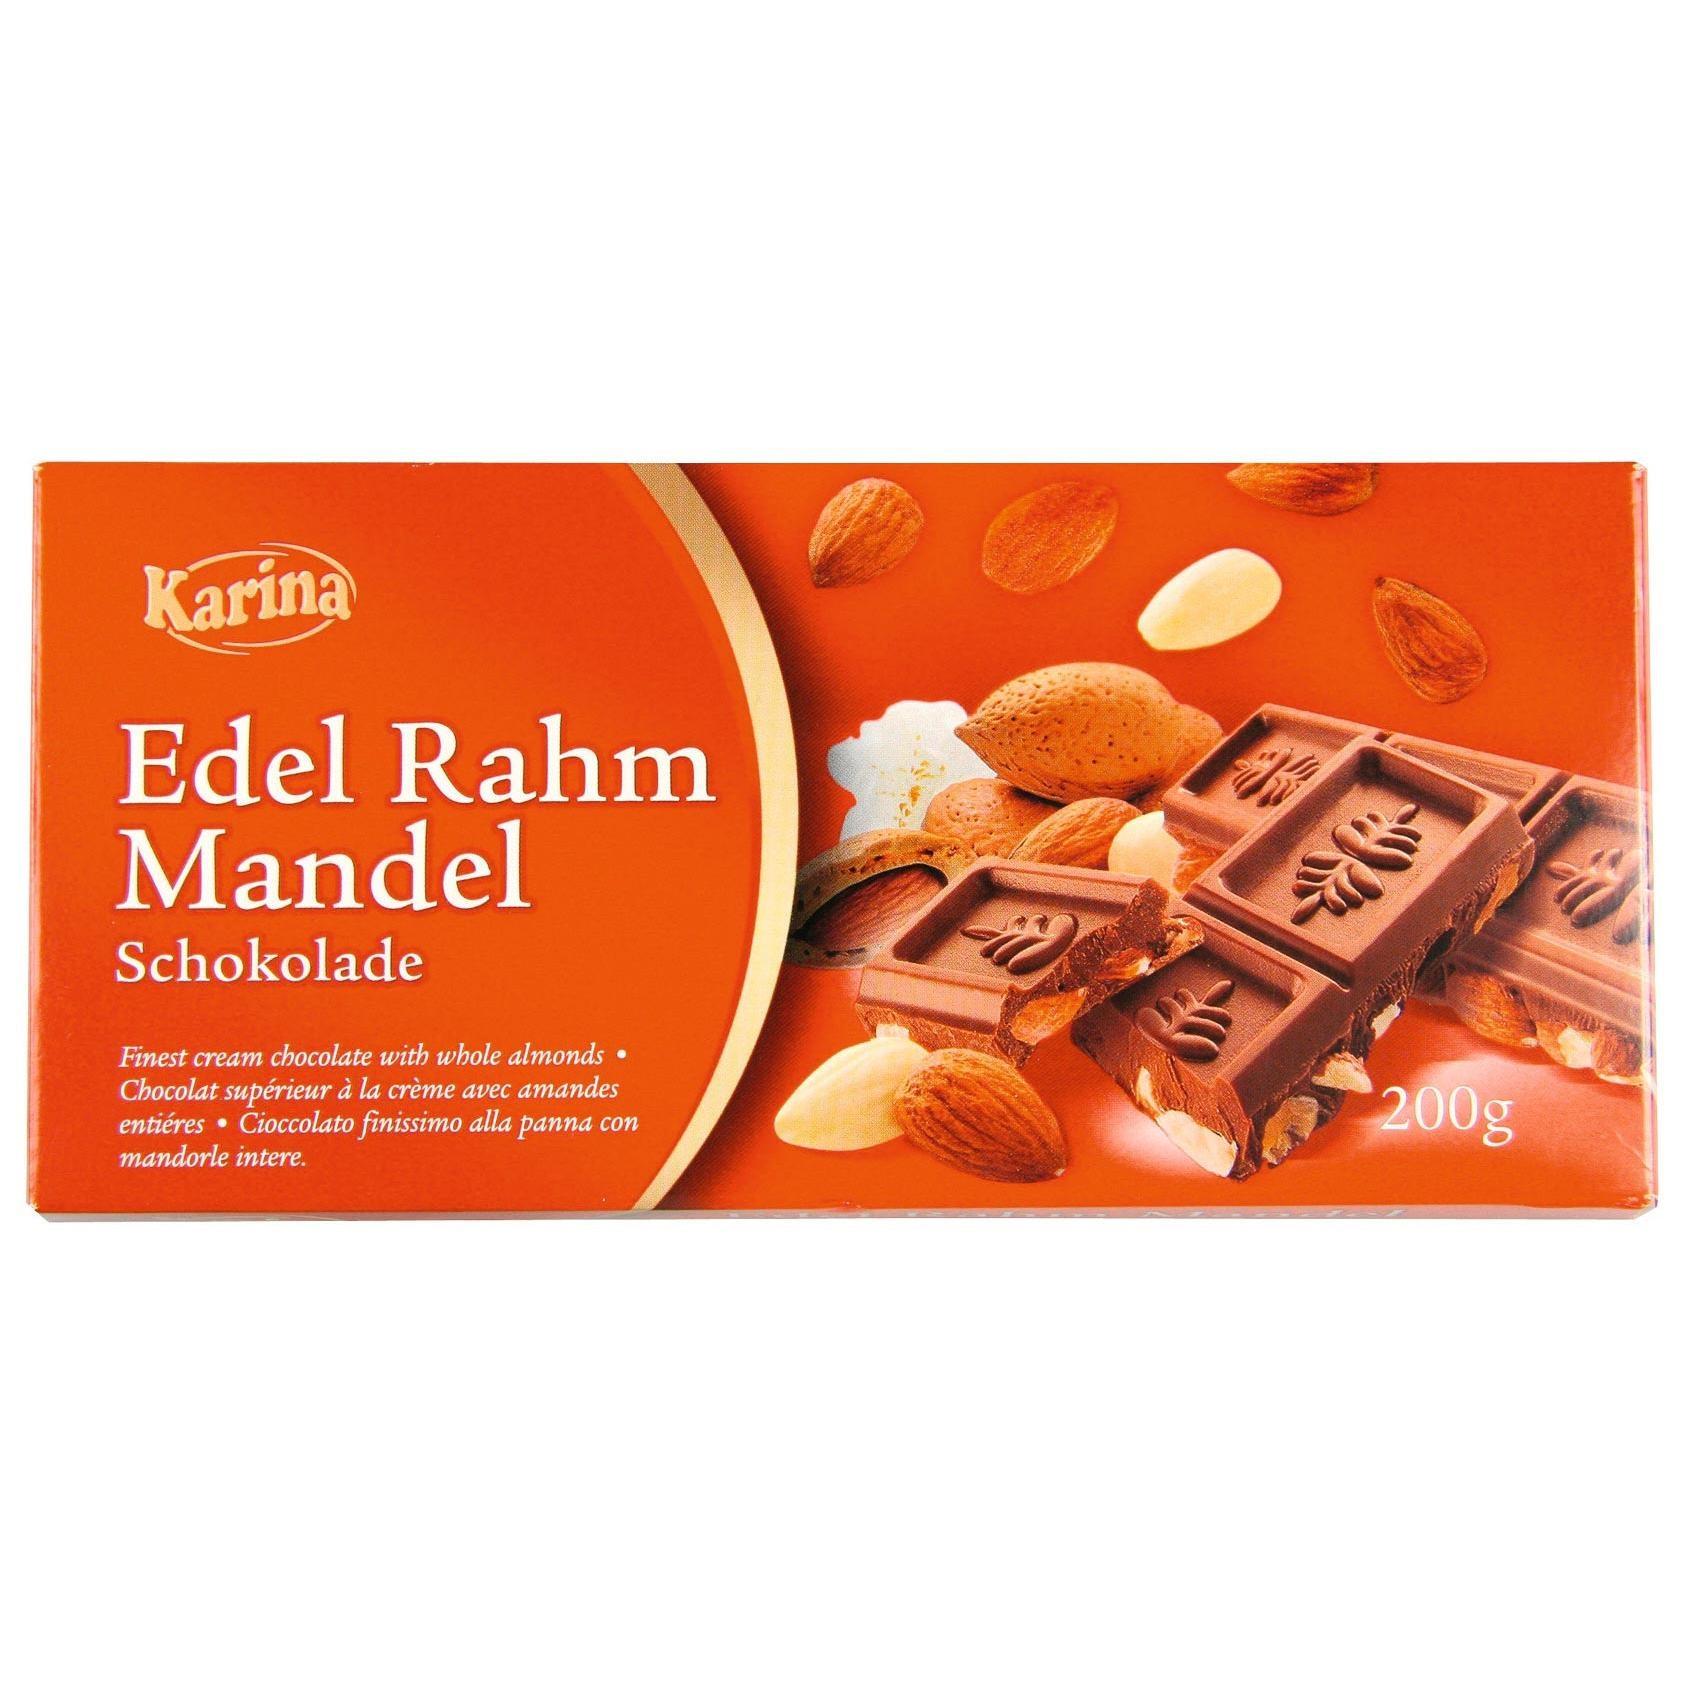 Karina - Edelrahm Mandel Schokolade - 200g